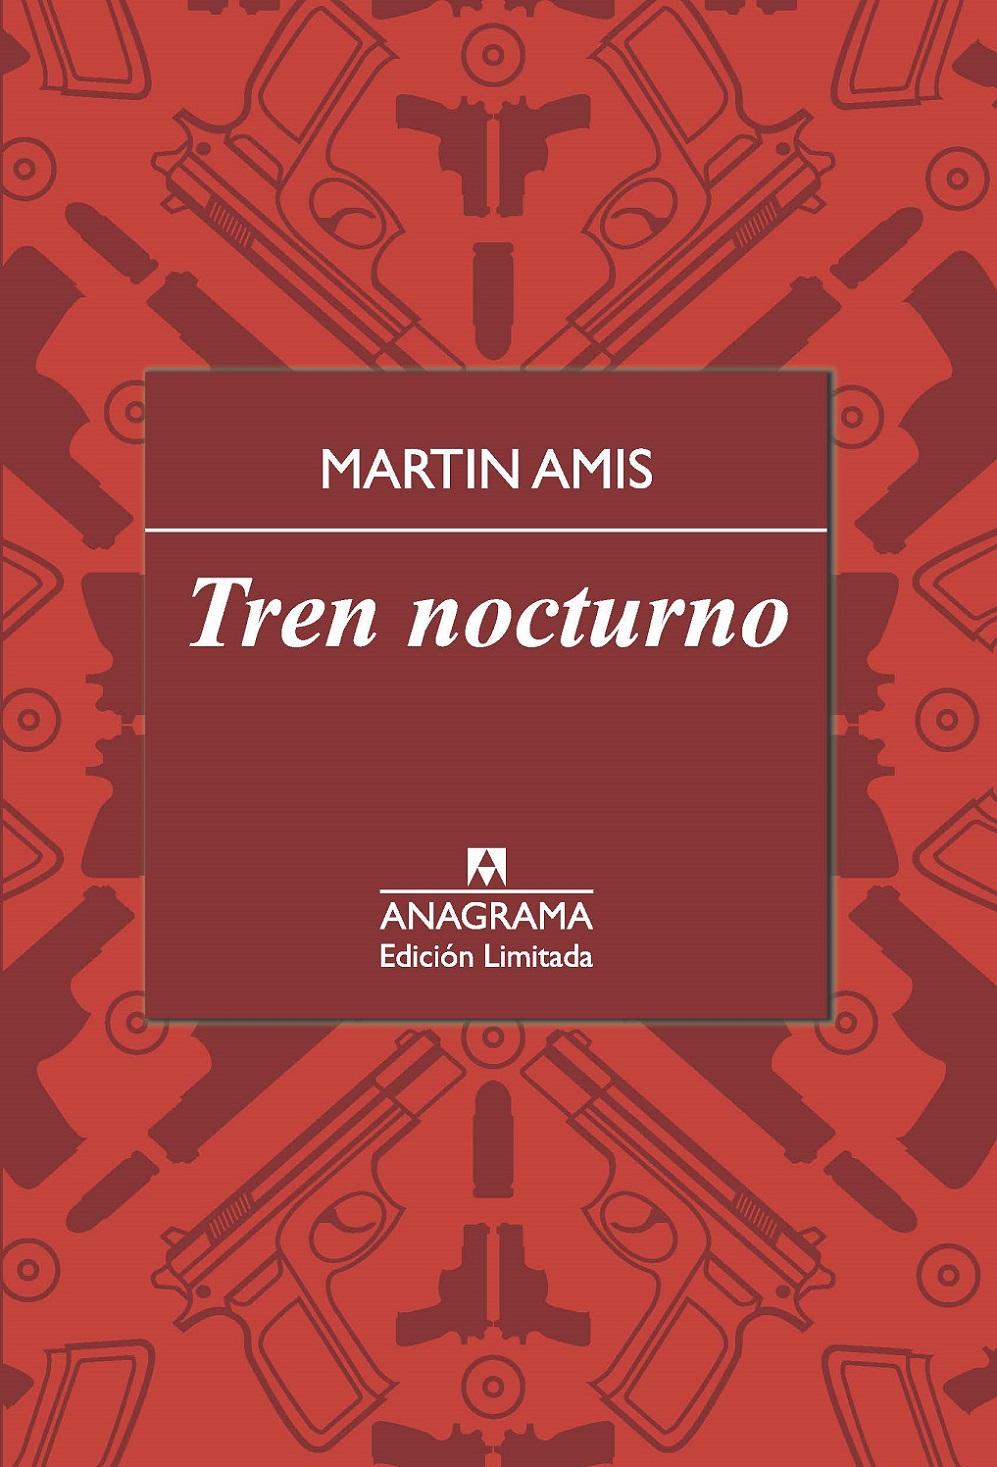 https://laantiguabiblos.blogspot.com/2020/08/tren-nocturno-martin-amis.html